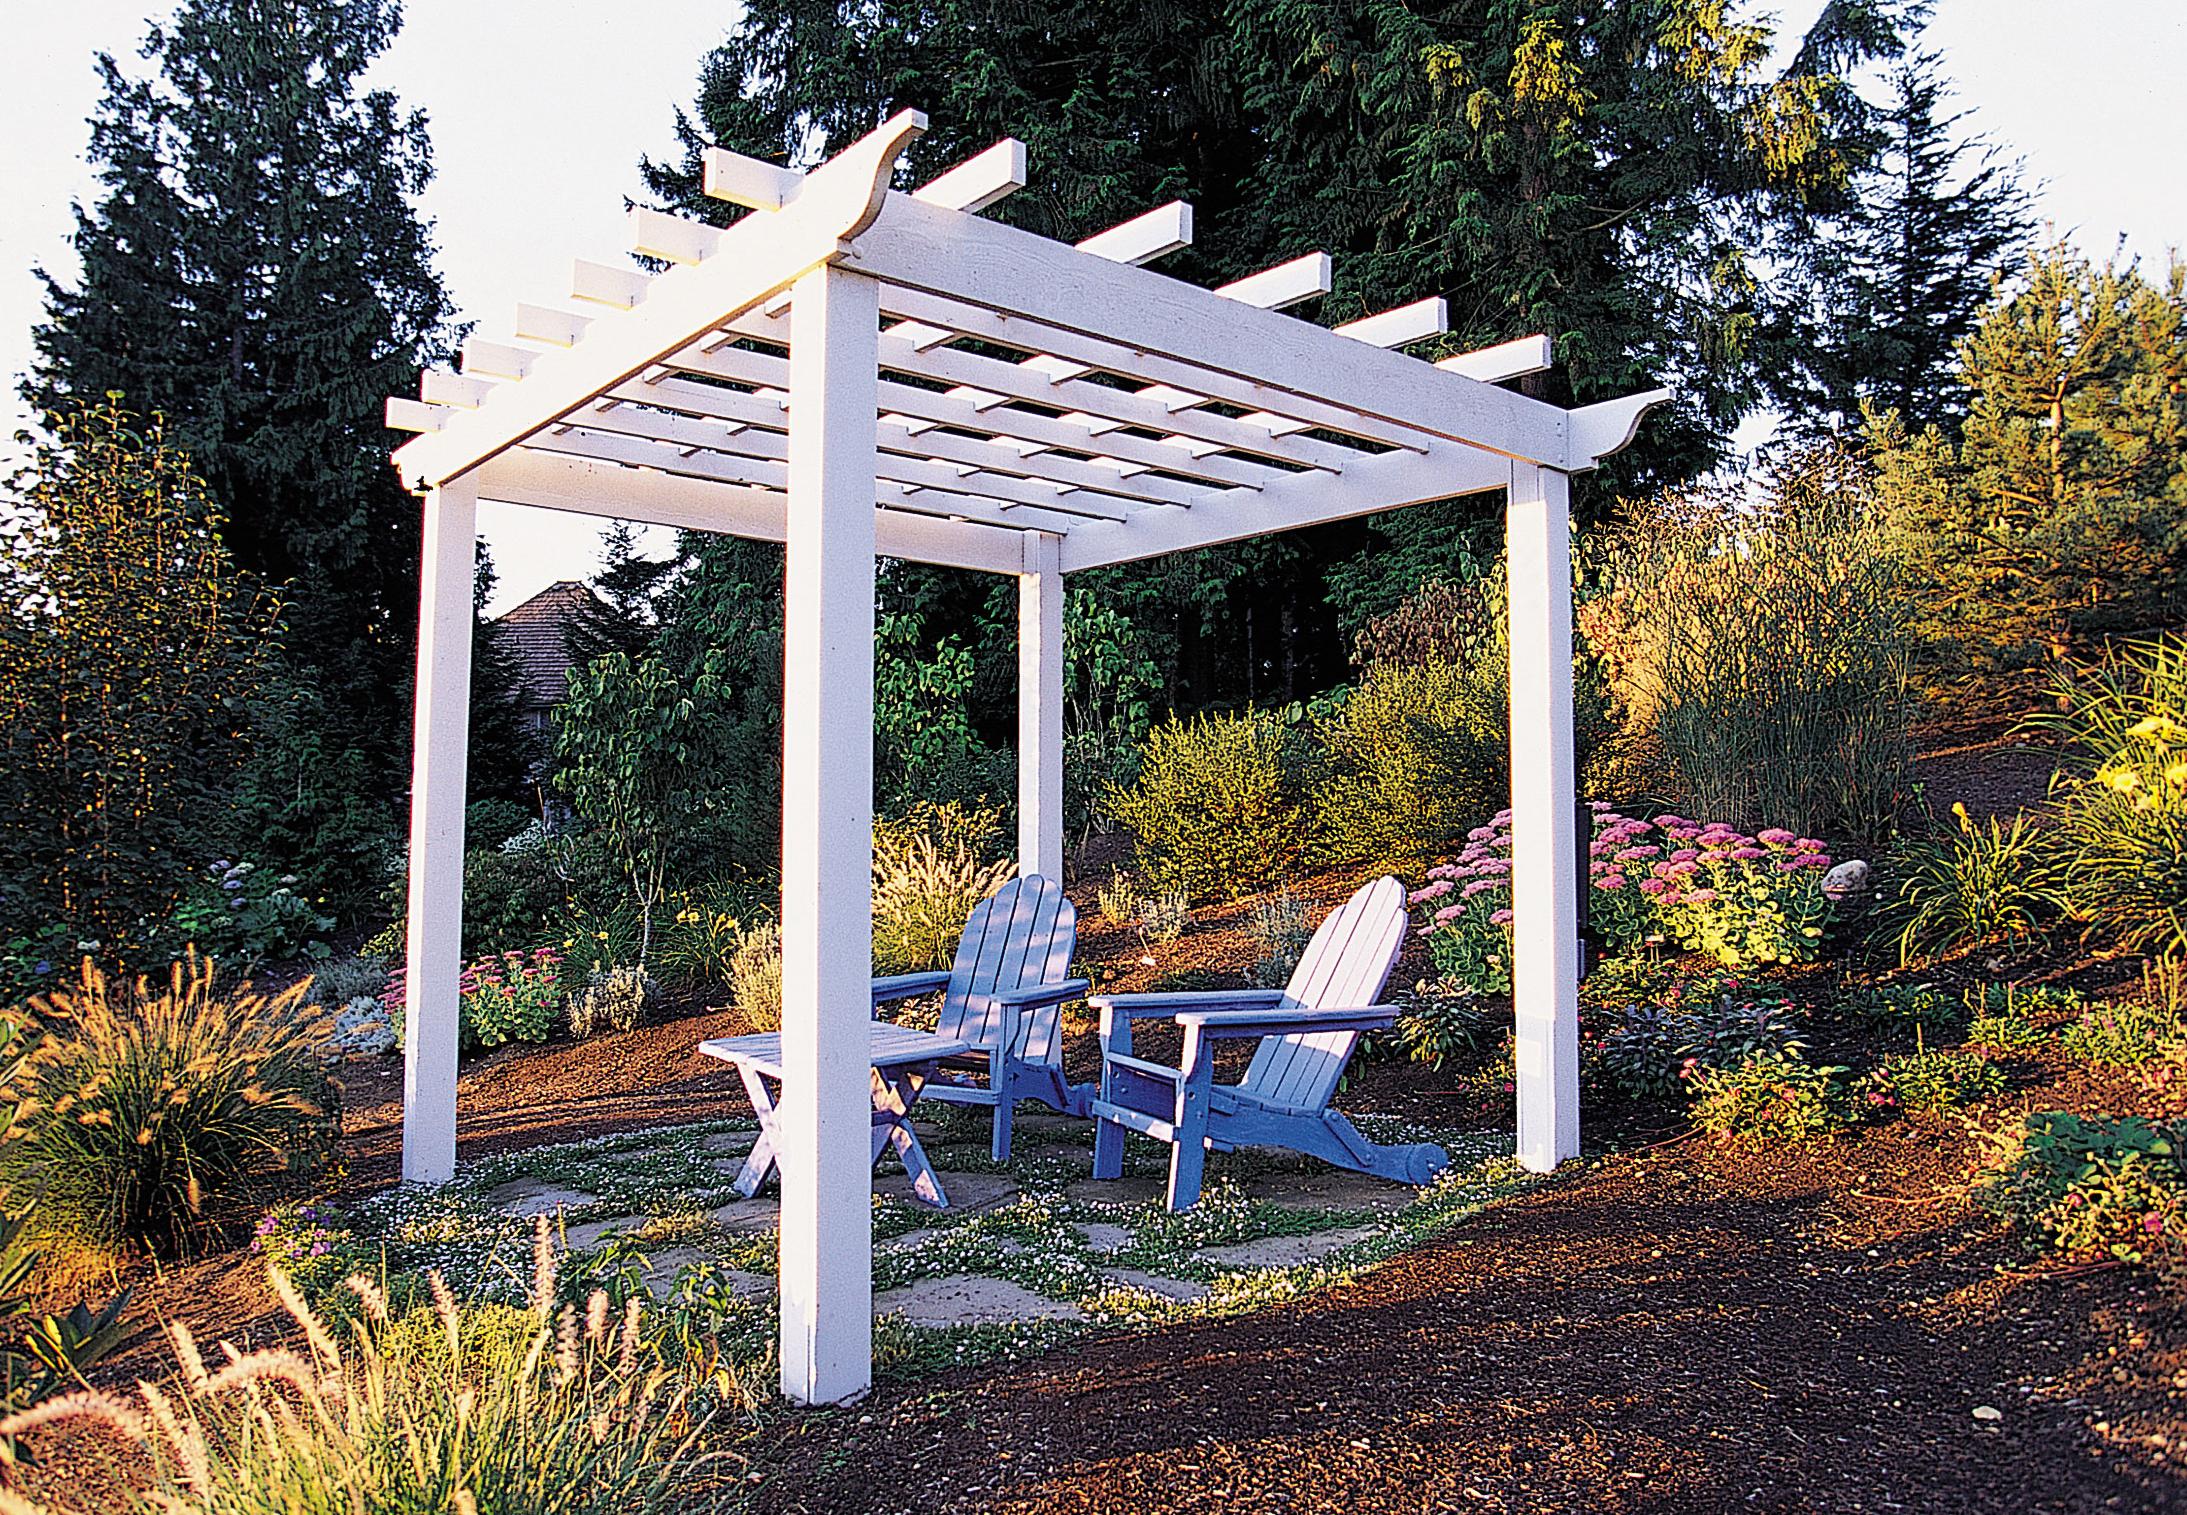 garden trellises how to make a great garden trellis or arbor - sunset magazine OWSWTIC